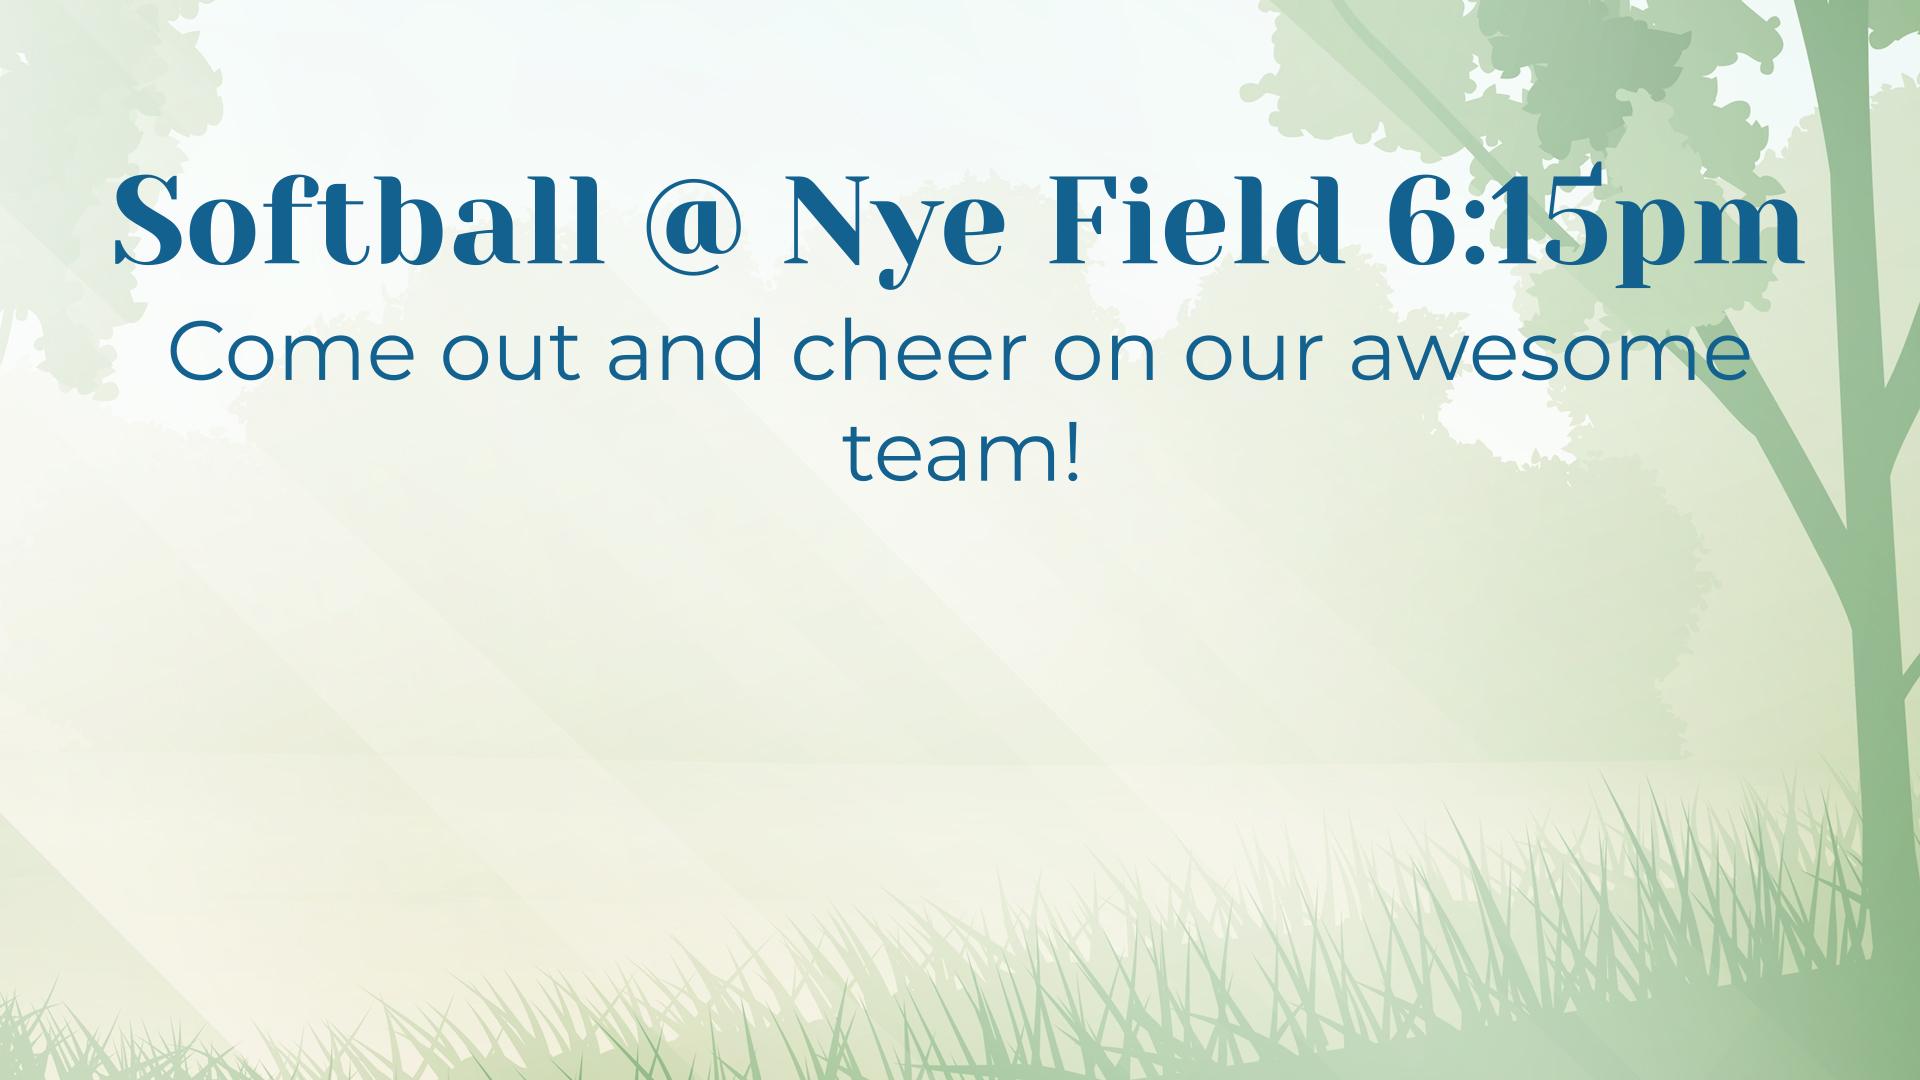 Softball @ Nye Field 6:15pm